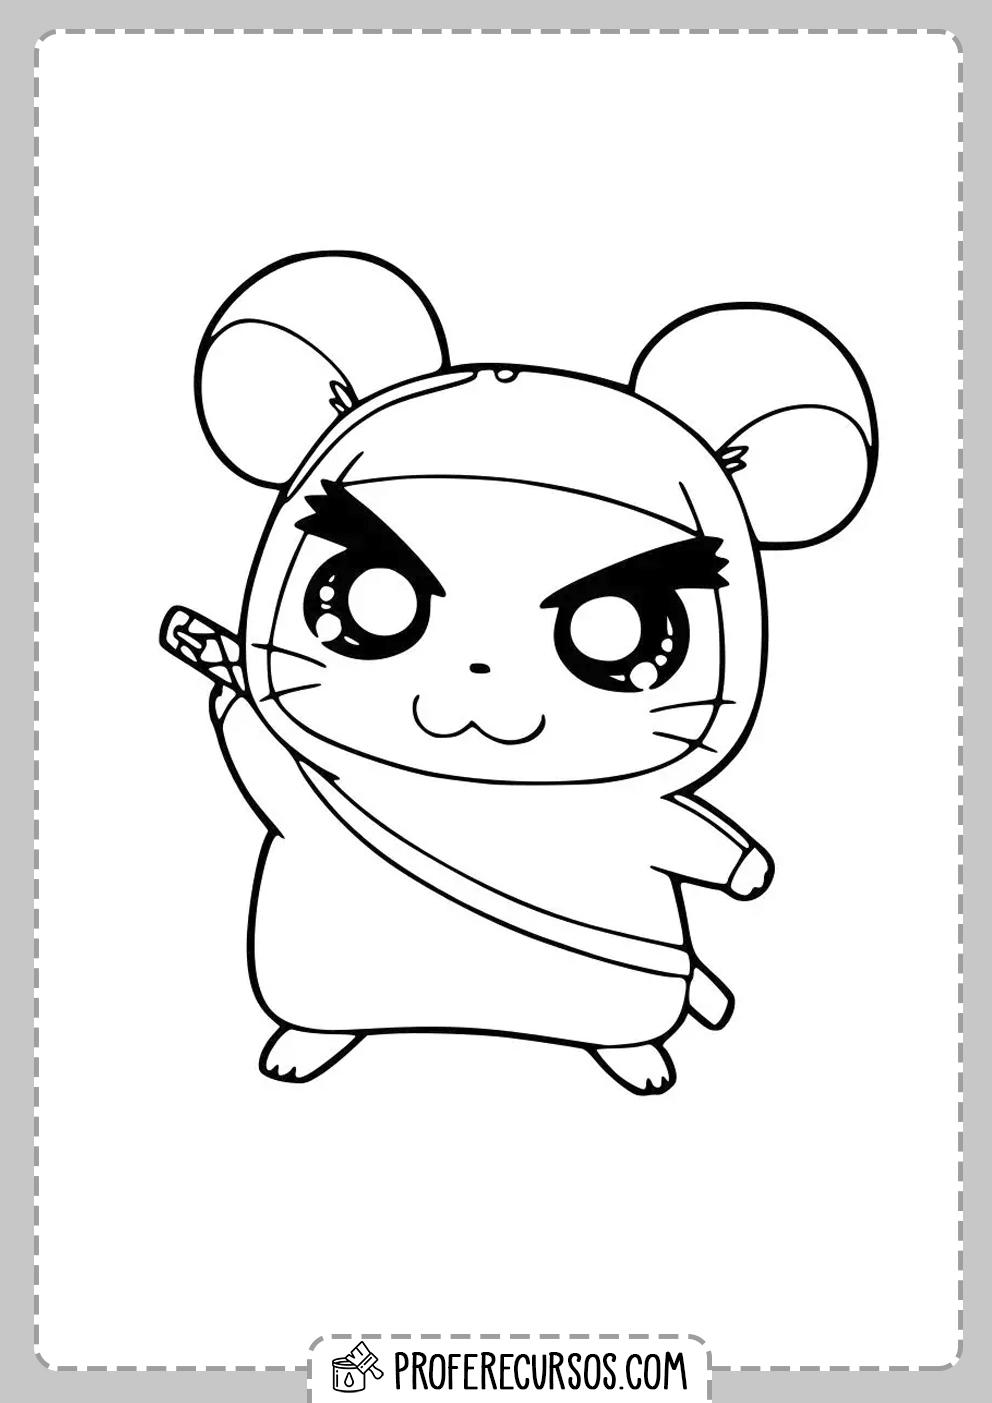 Dibujo Hamster Kawaii Colorear